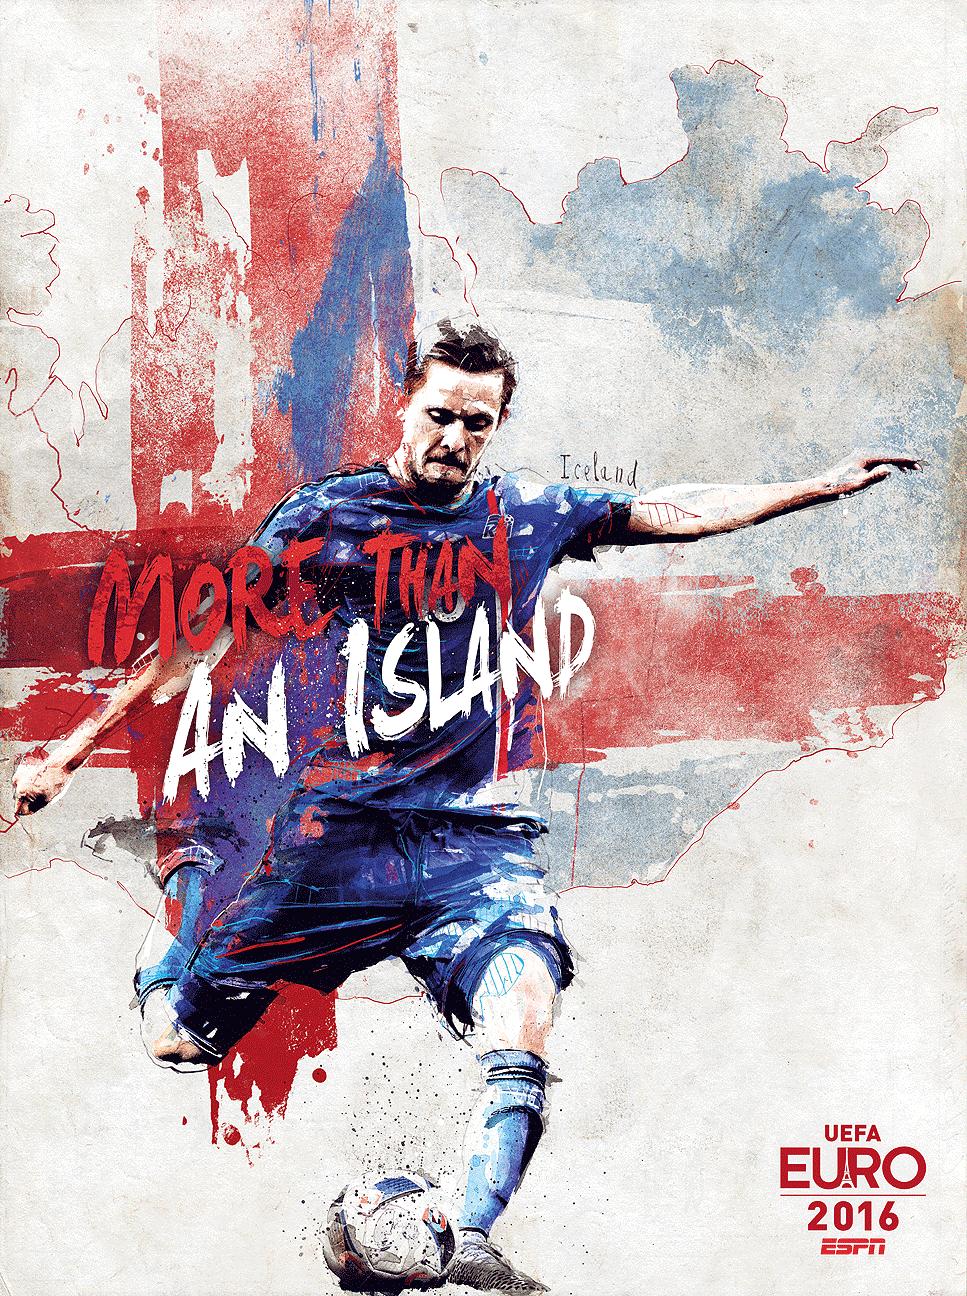 Euro 2016 team posters スポーツグラフィック, スポーツデザイン, サッカー